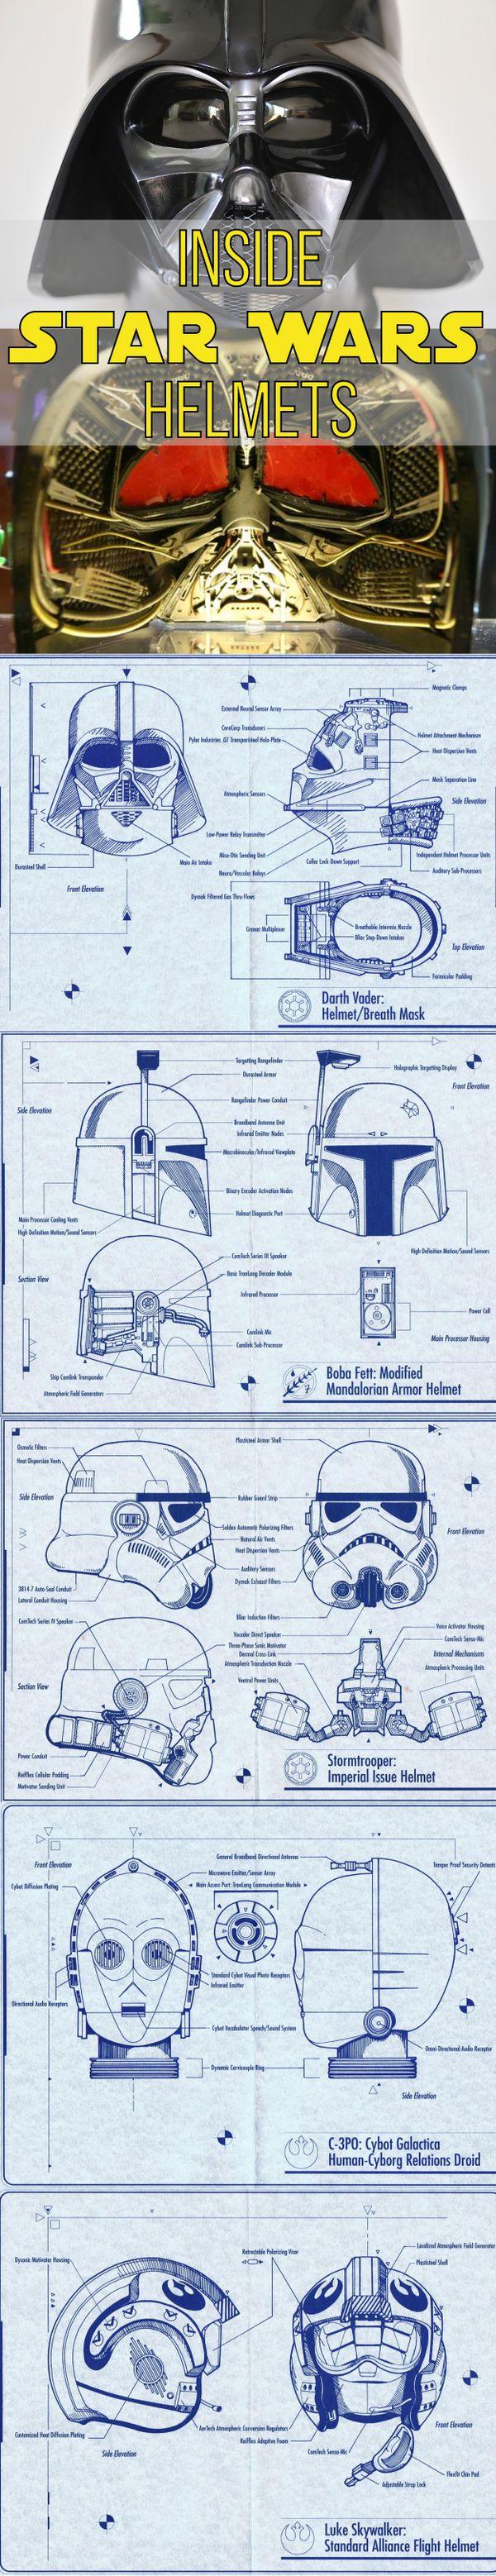 Inside Star Wars helmets! Very cool! #StarWars #tfishboard